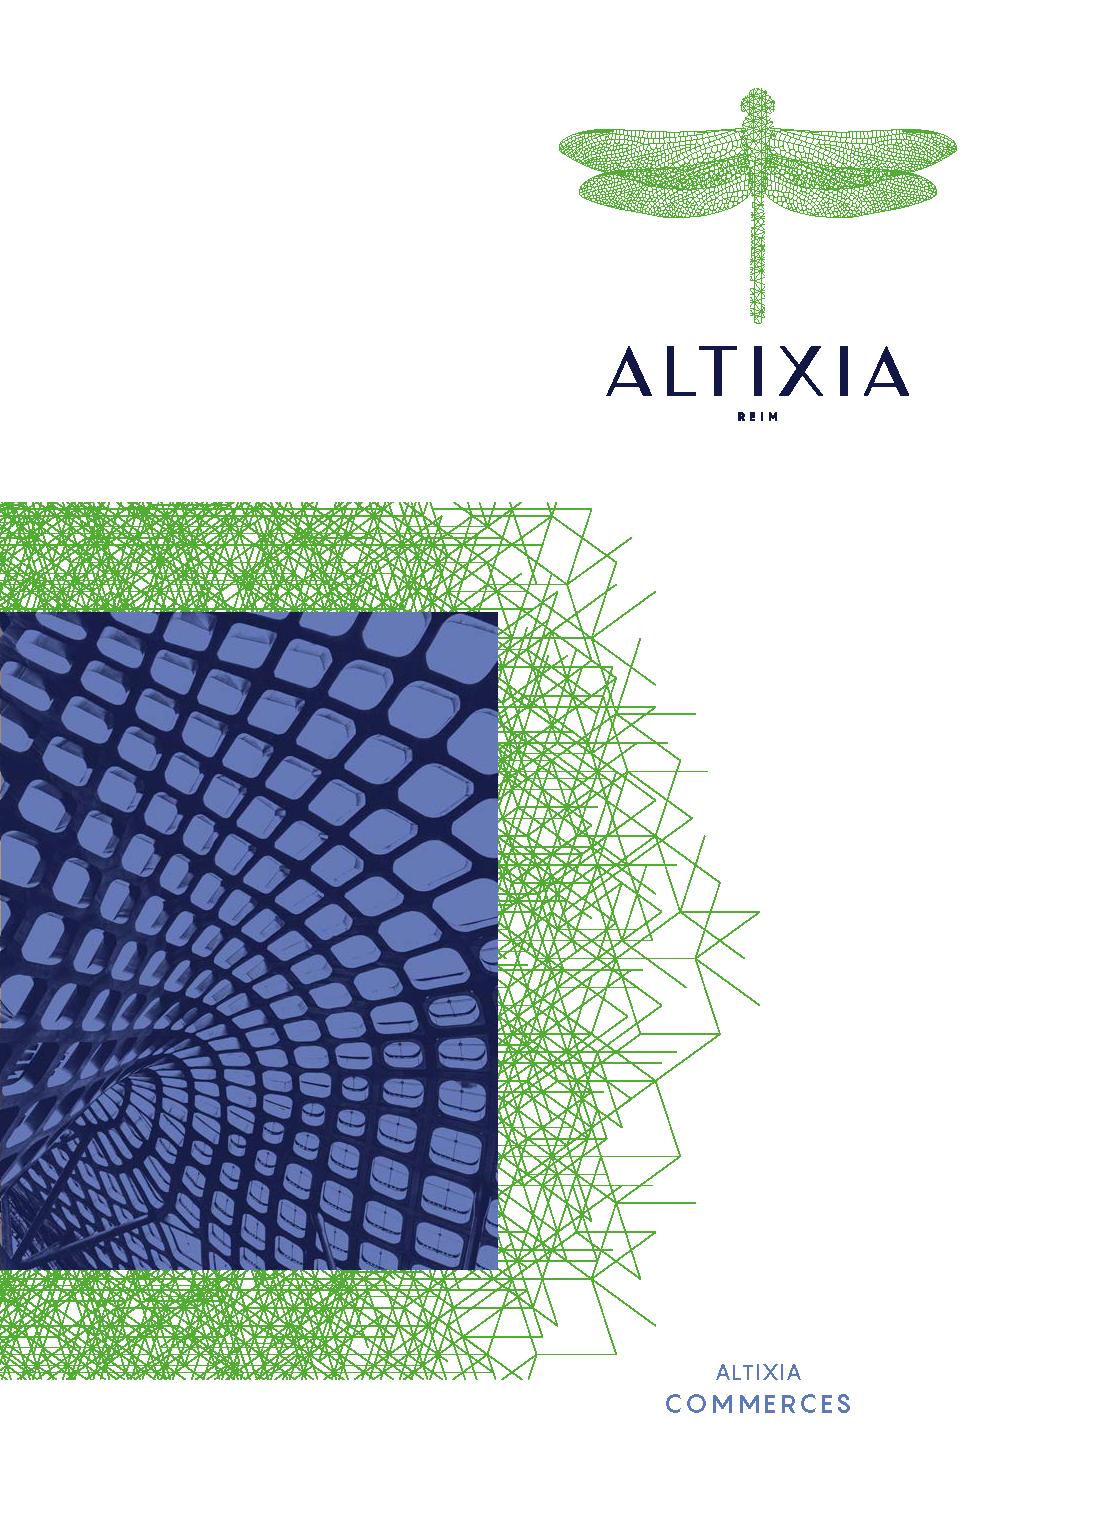 ALTIXIA COMMERCES